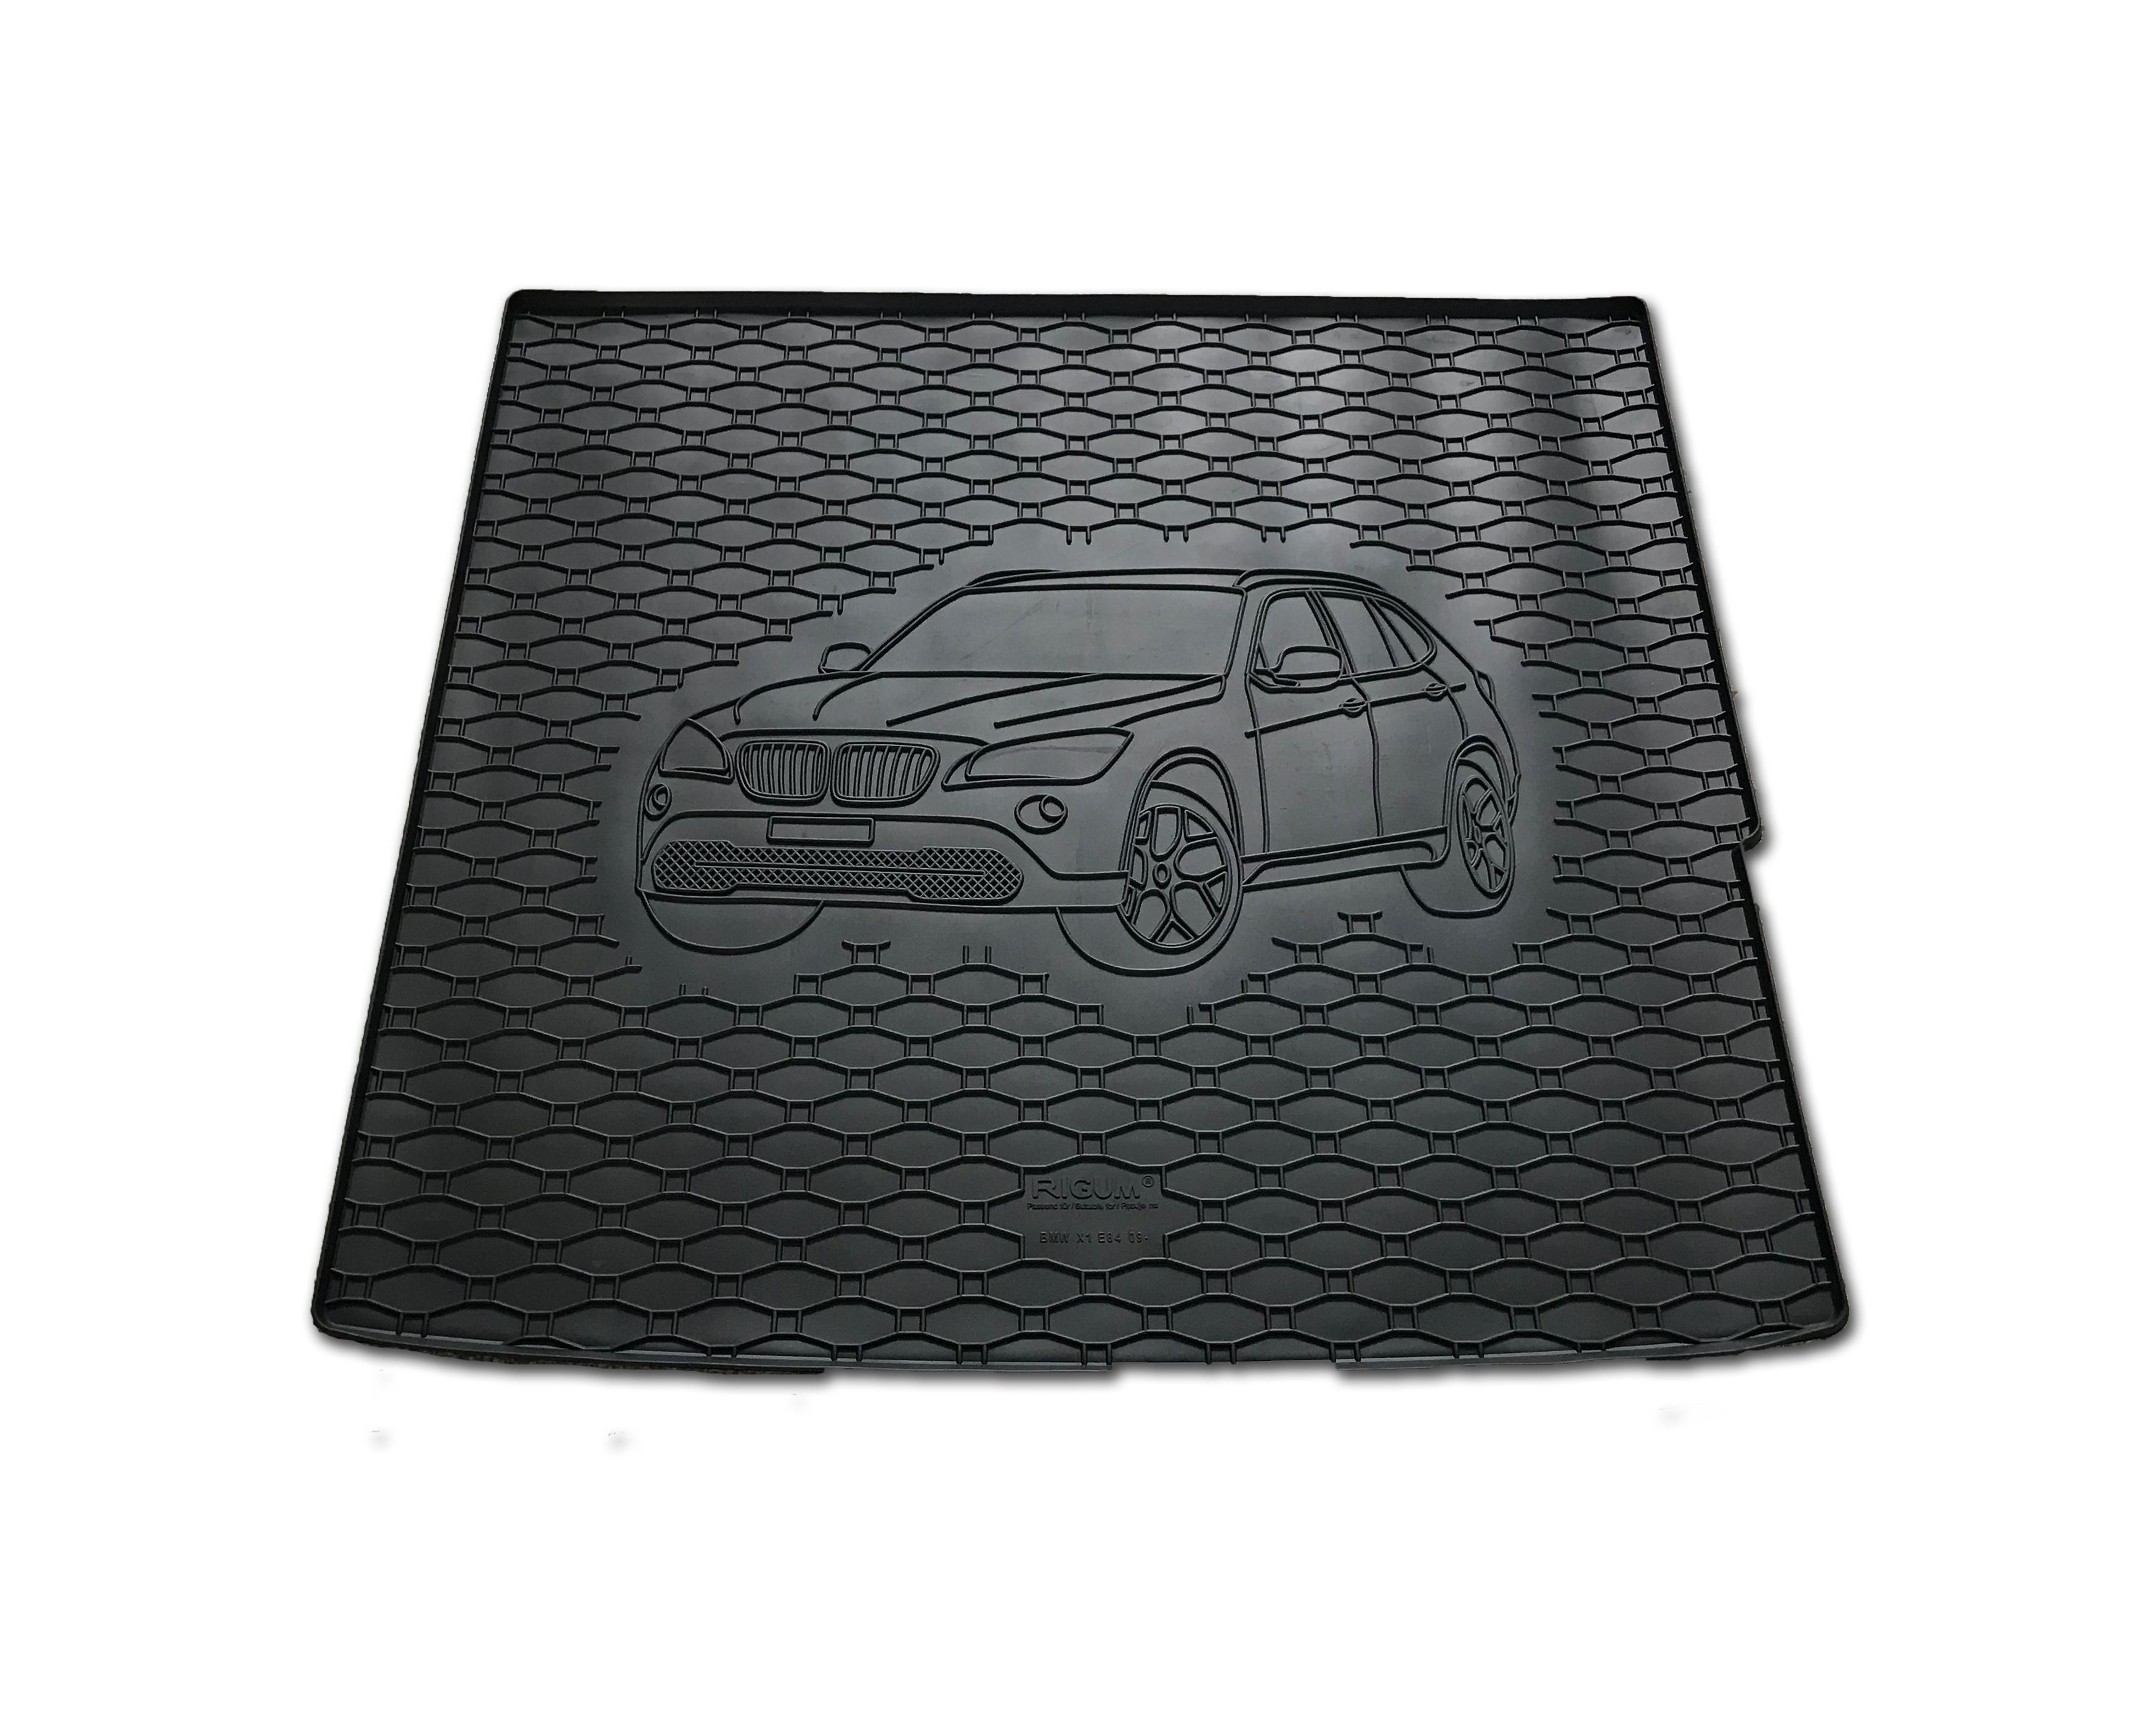 Automega Vana do kufru gumová RIGUM BMW X1 E84 2009-2016